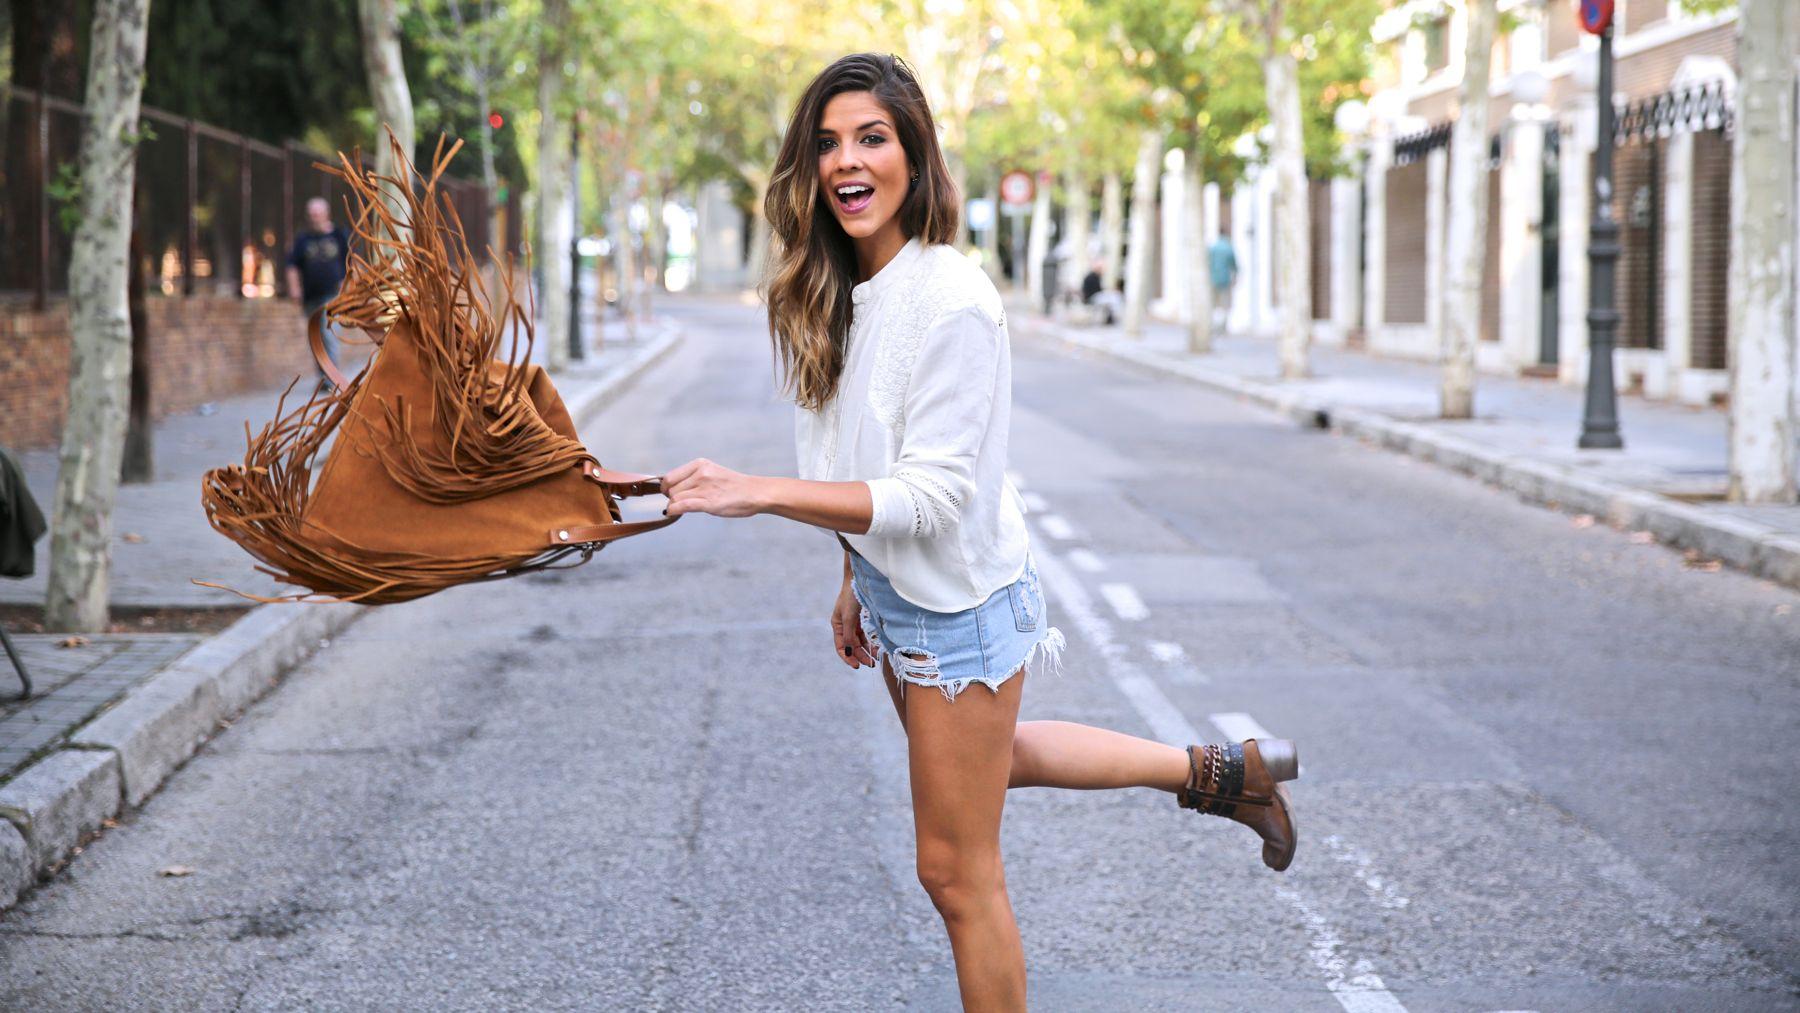 trendy_taste-look-outfit-street_style-ootd-blog-blogger-fashion_spain-moda_españa-boho-hippie-flecos-botines_camperos-cowboy_booties-mochila-backpack-blusa-camisa-denim-shorts-vaqueros-1